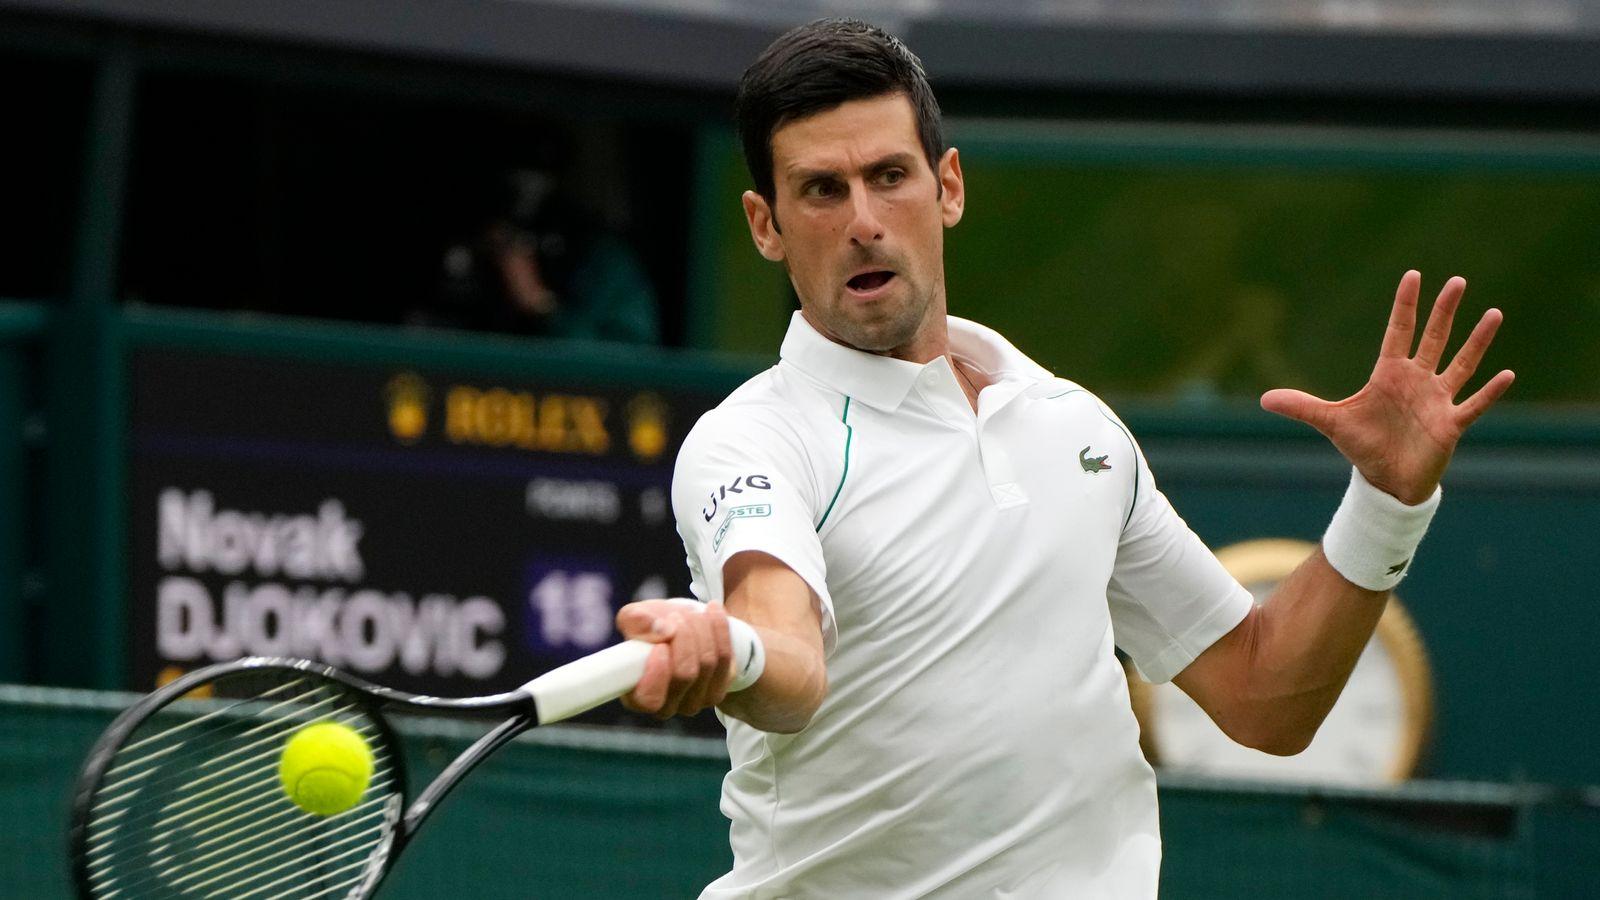 skysports novak djokovic tennis 5430287 - Đoković vpisal še 75. zmago na sveti travi Wimbledona